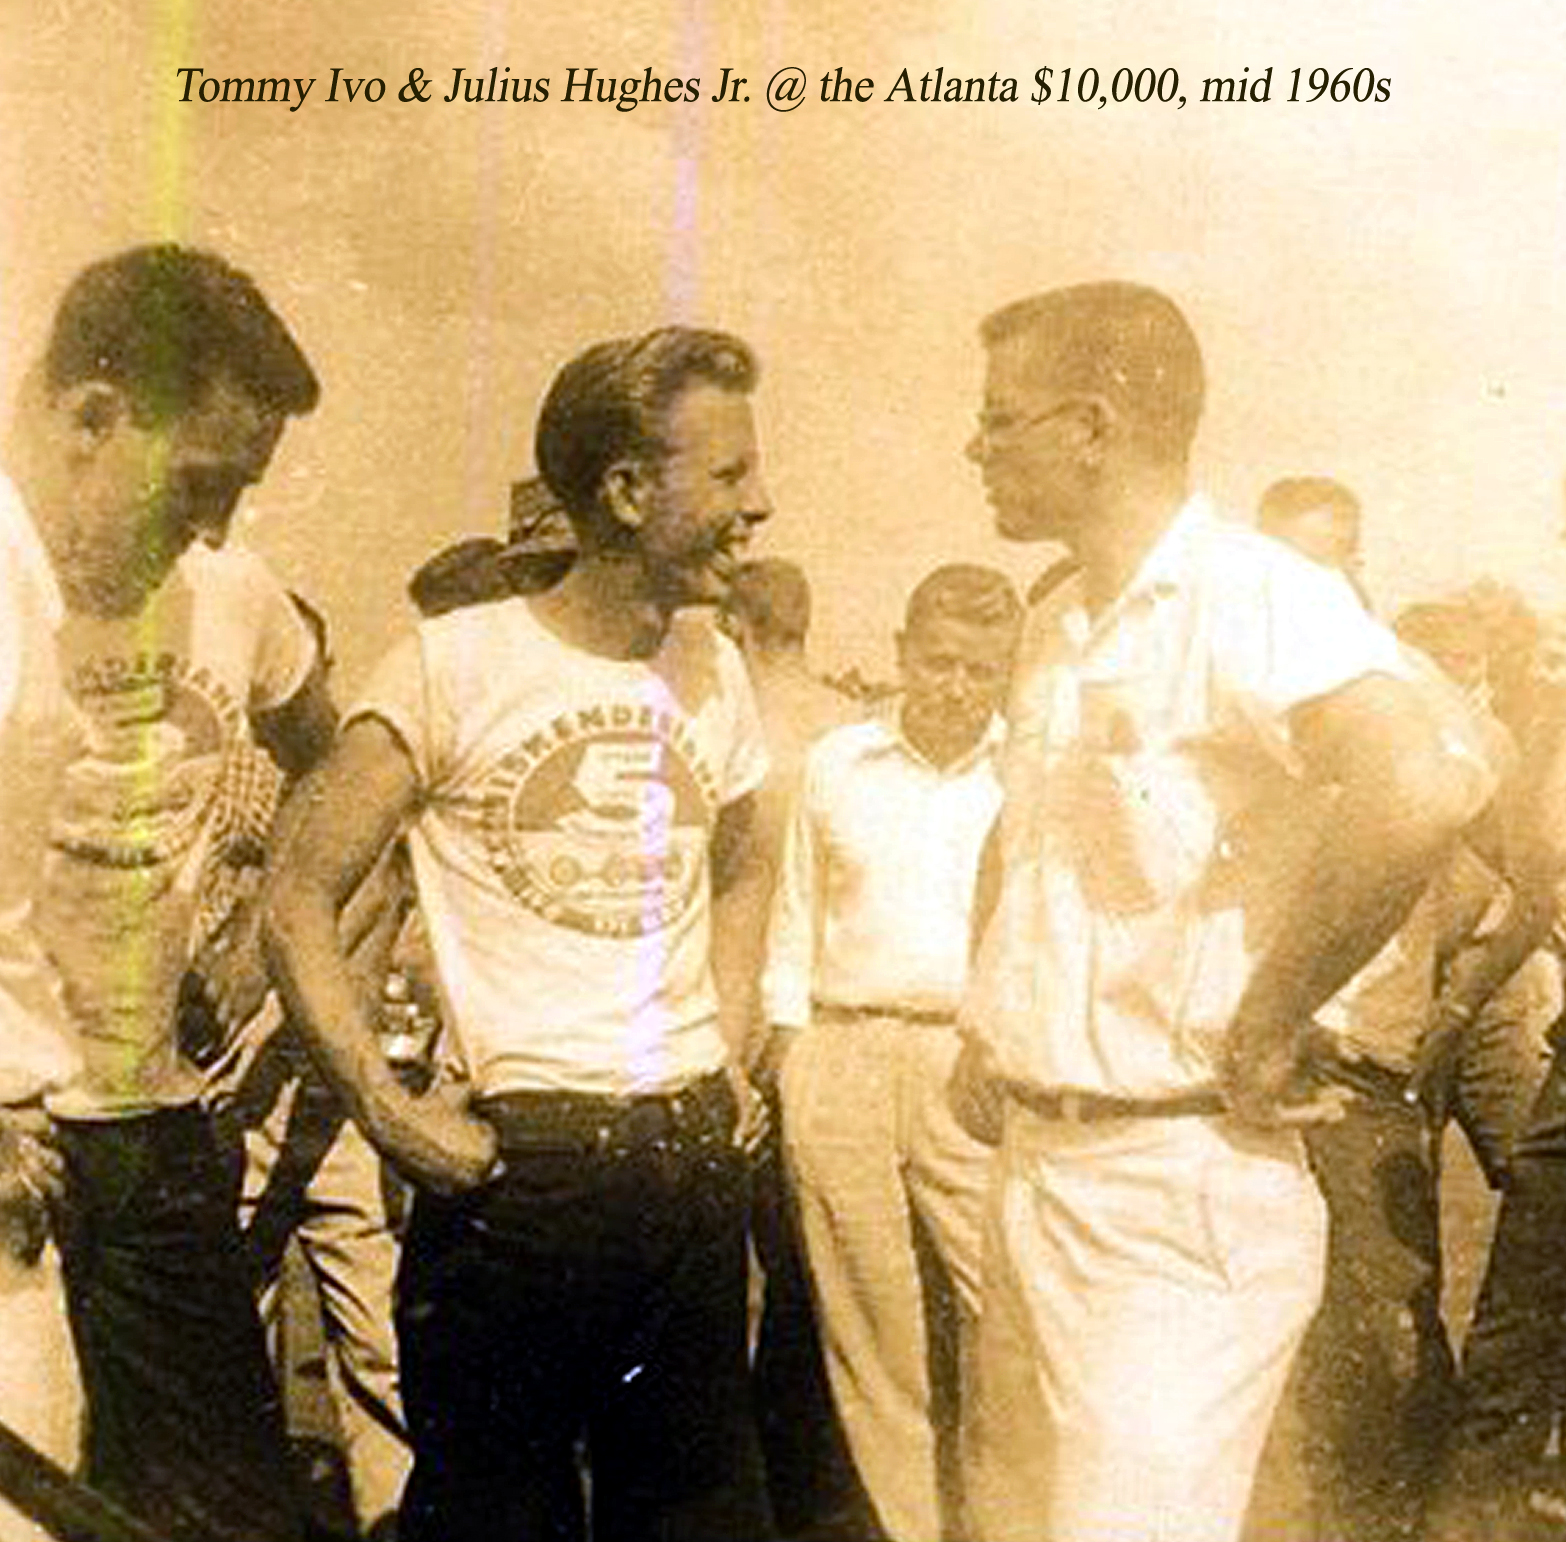 Ivo and Hughes.jpg